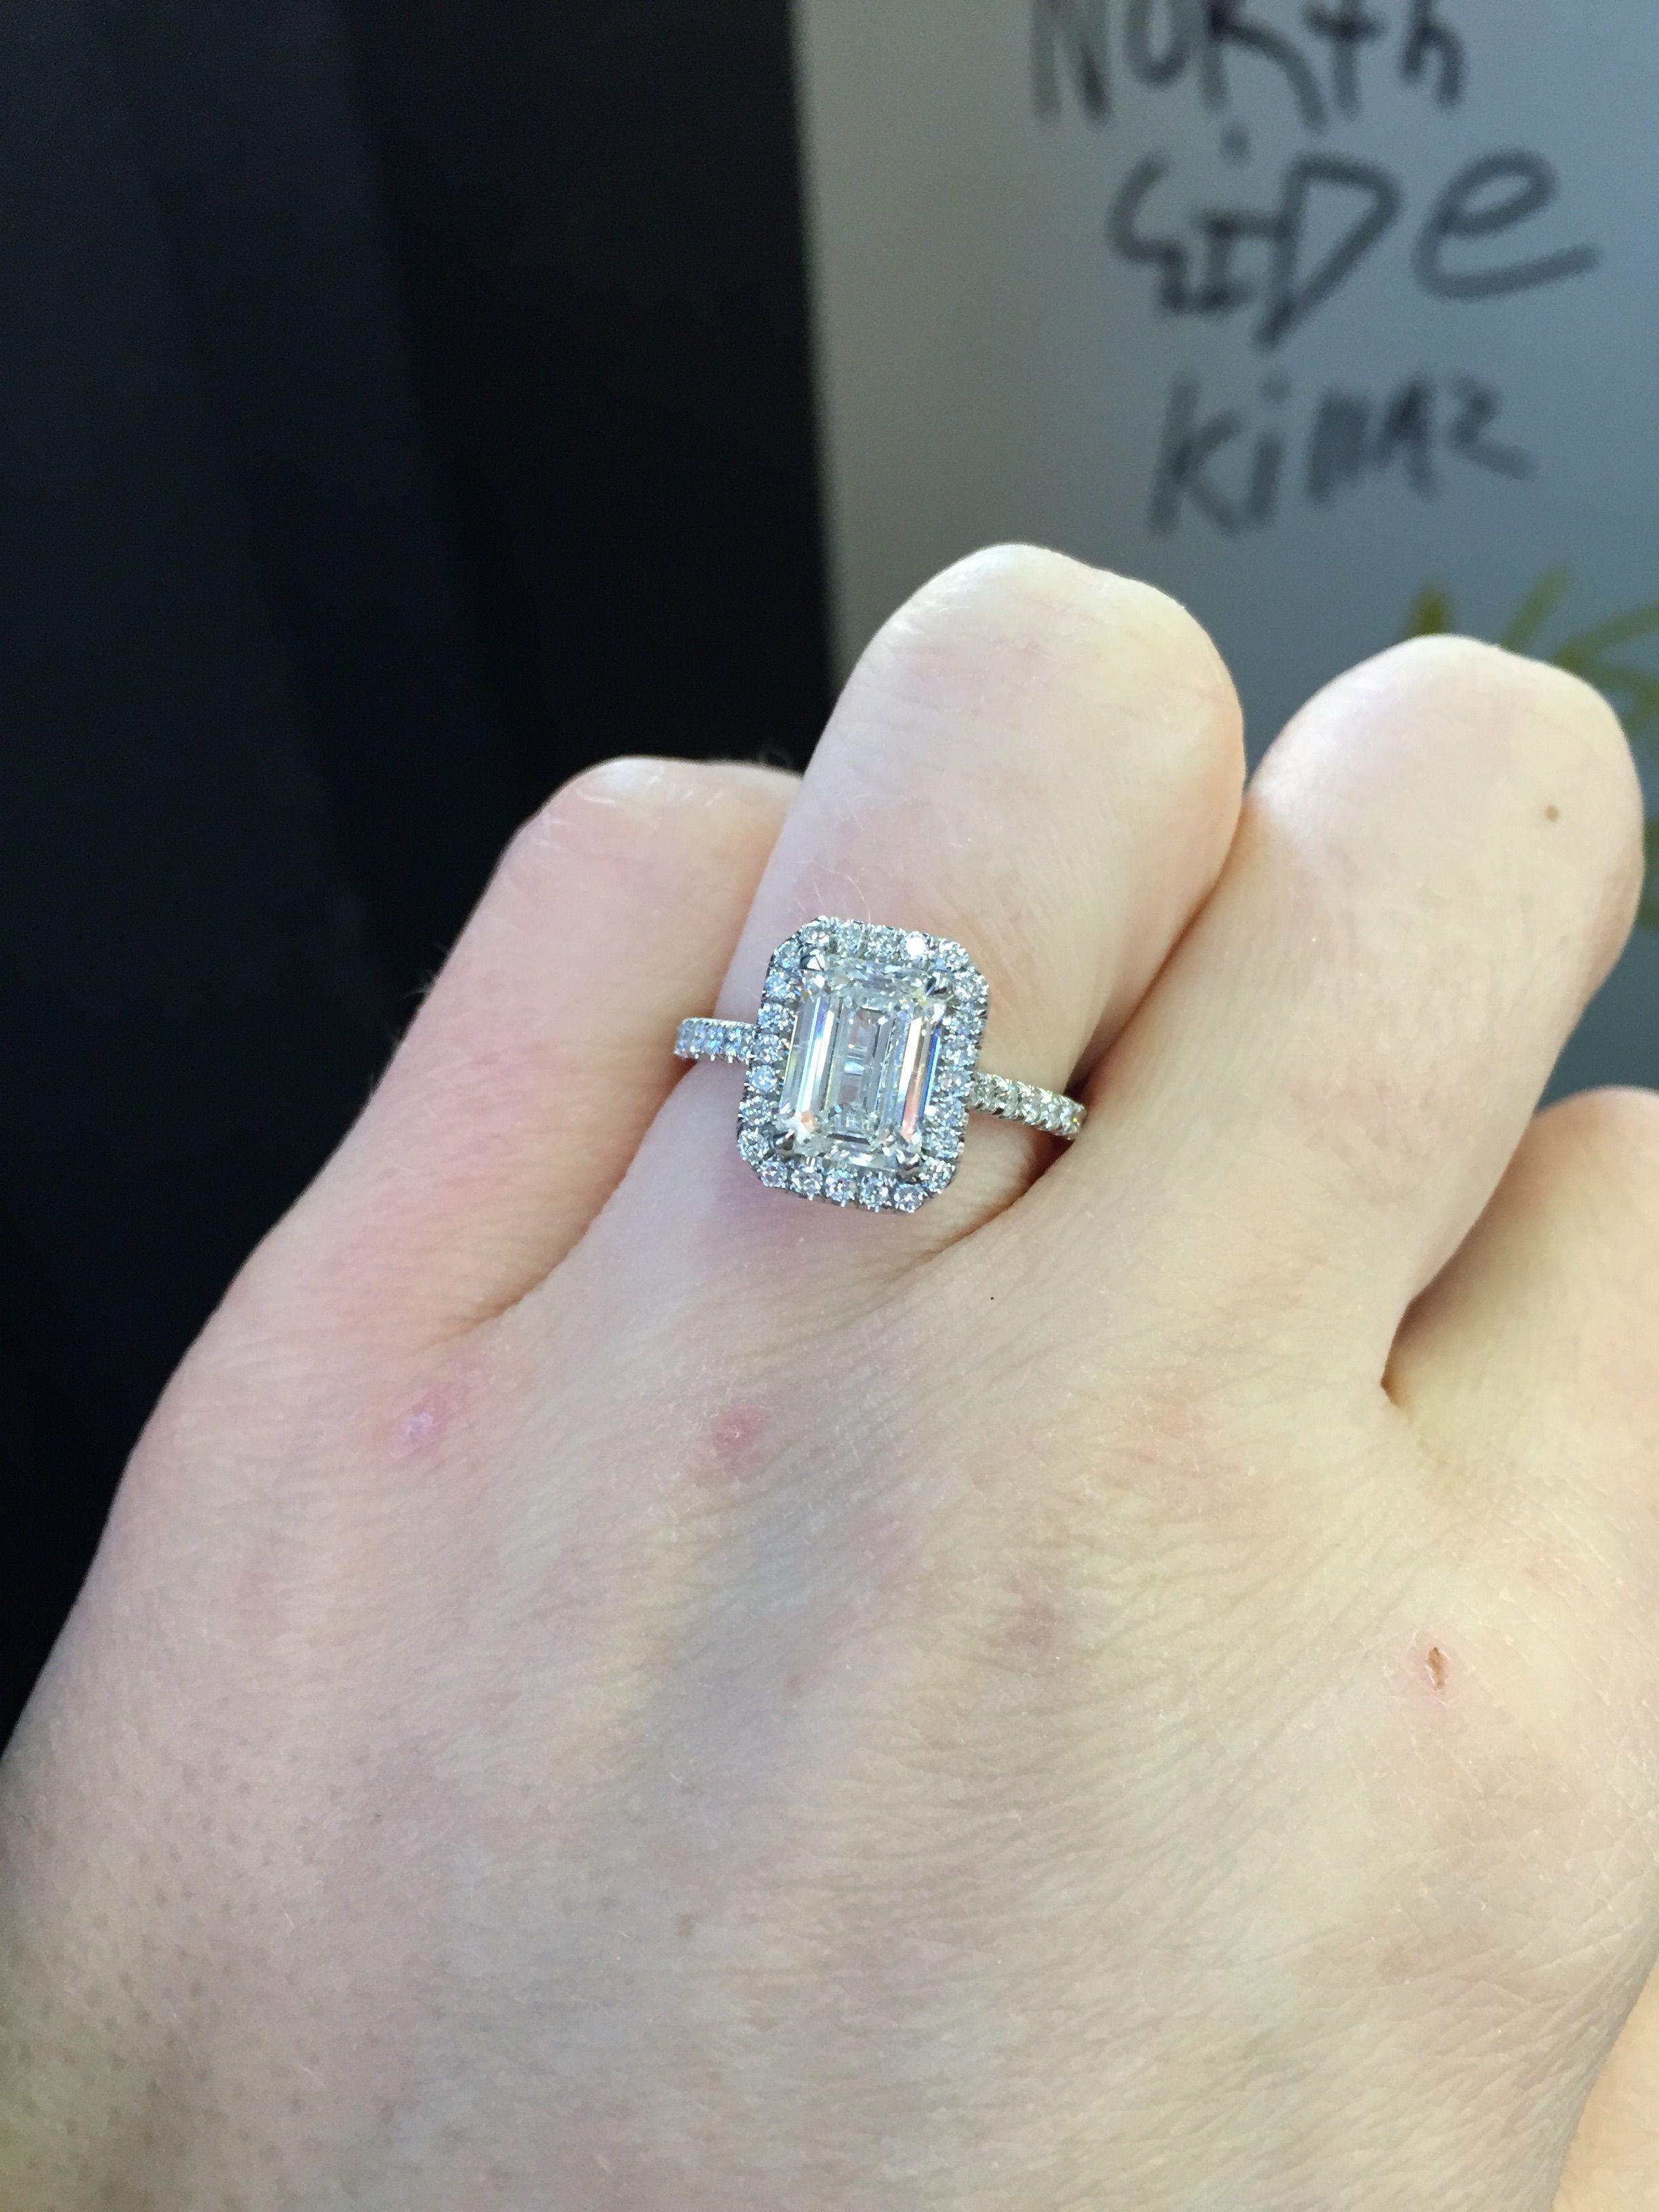 15ct center size 5 finger emerald pinterest